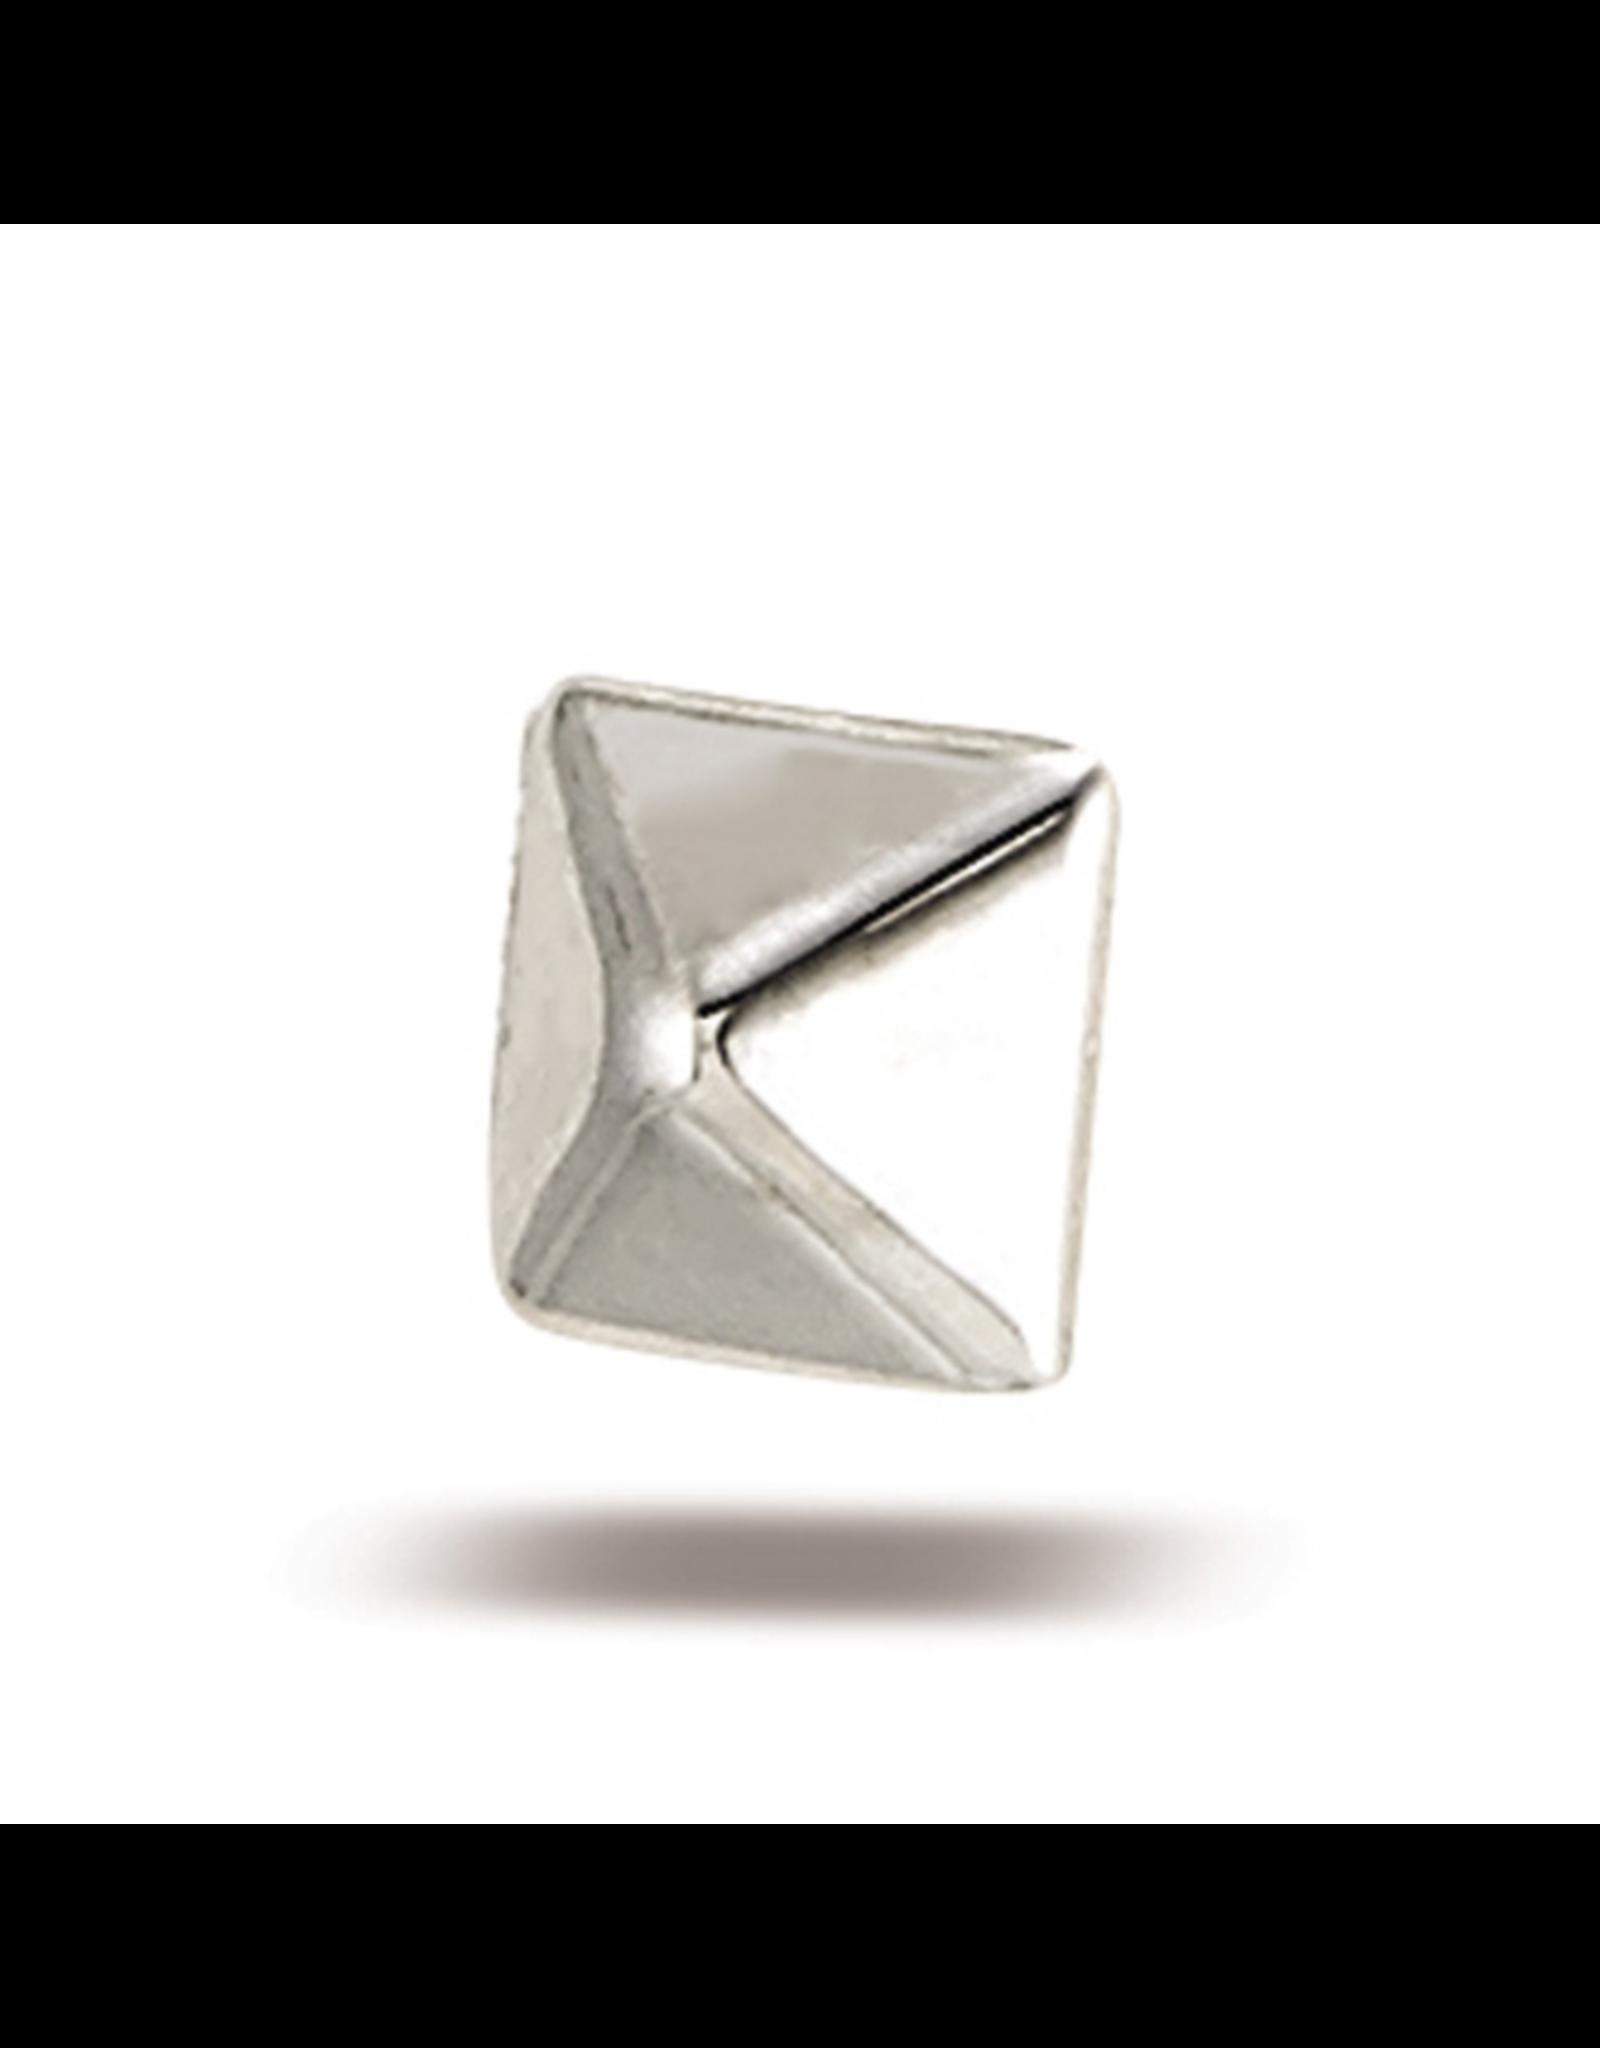 14k White Gold Pyramid (3.25mm)